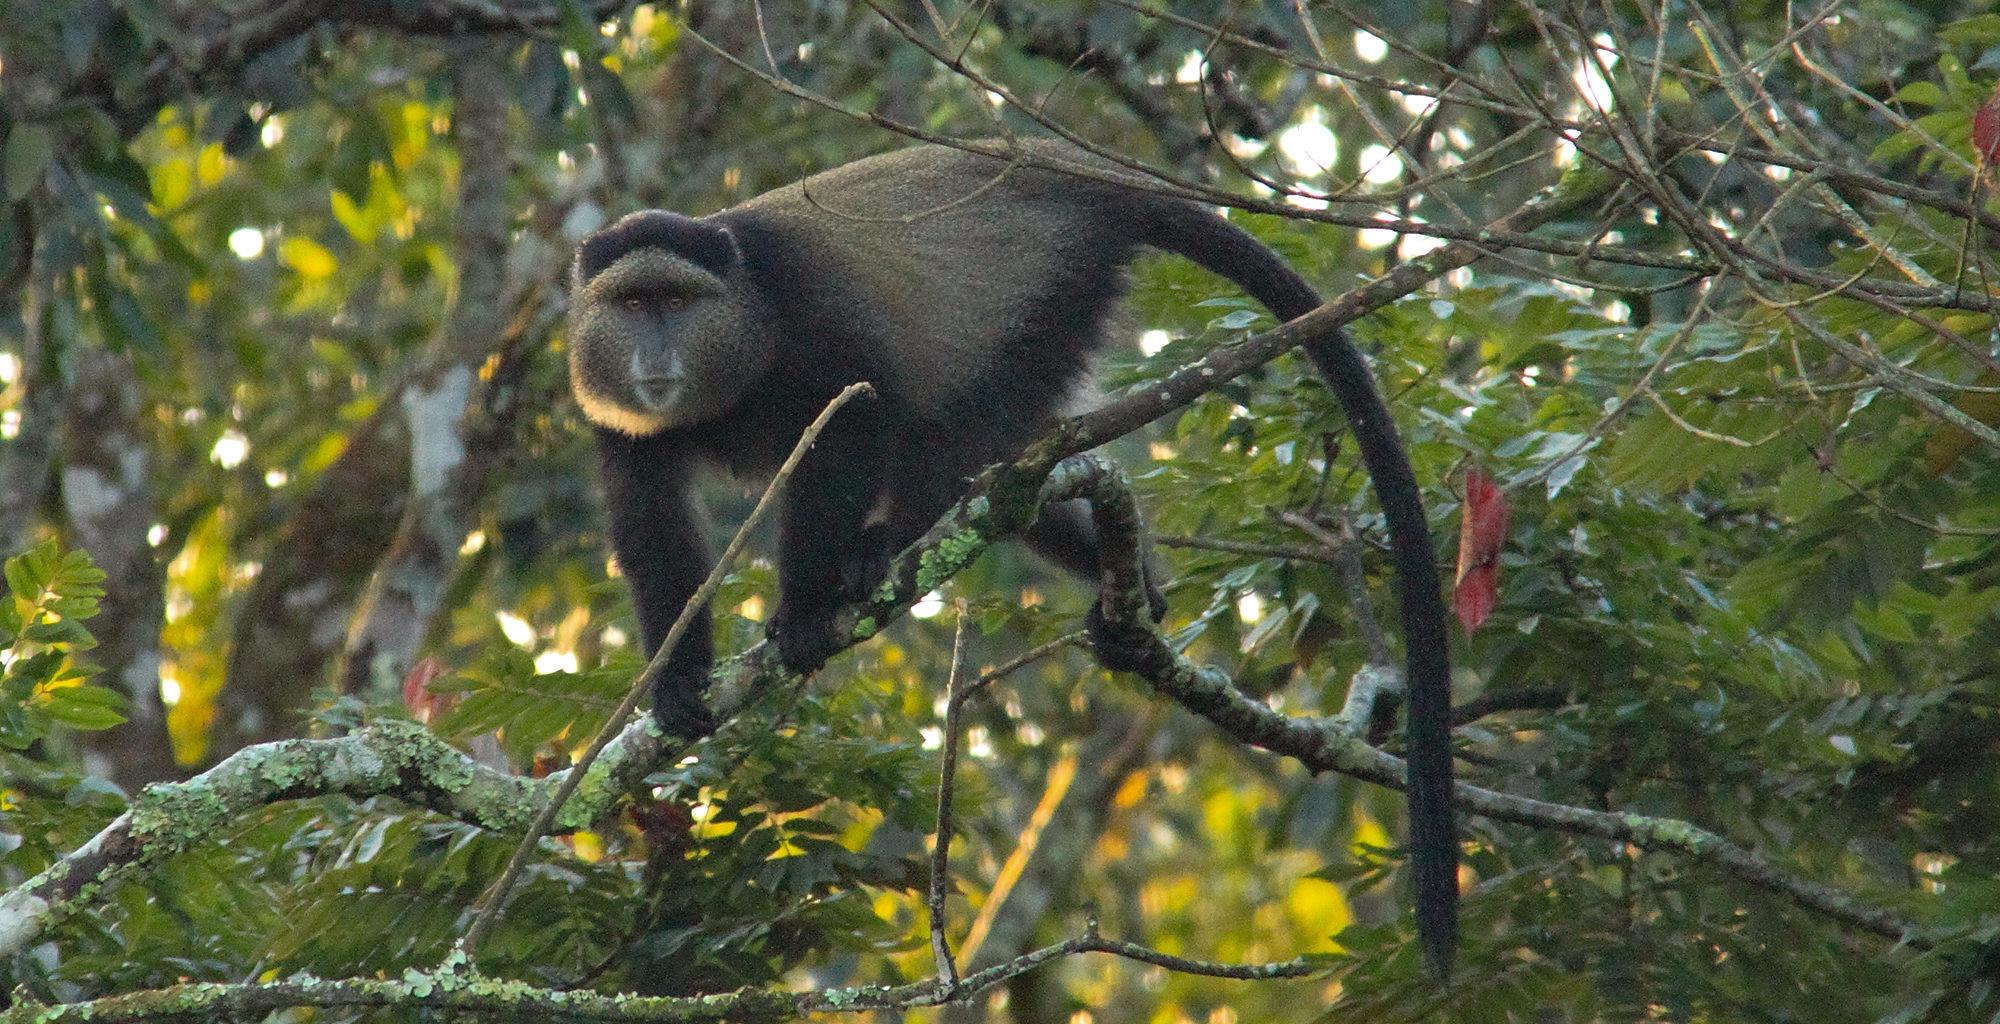 Rwanda-Nyungwe-National-Park-Golden-Monkey